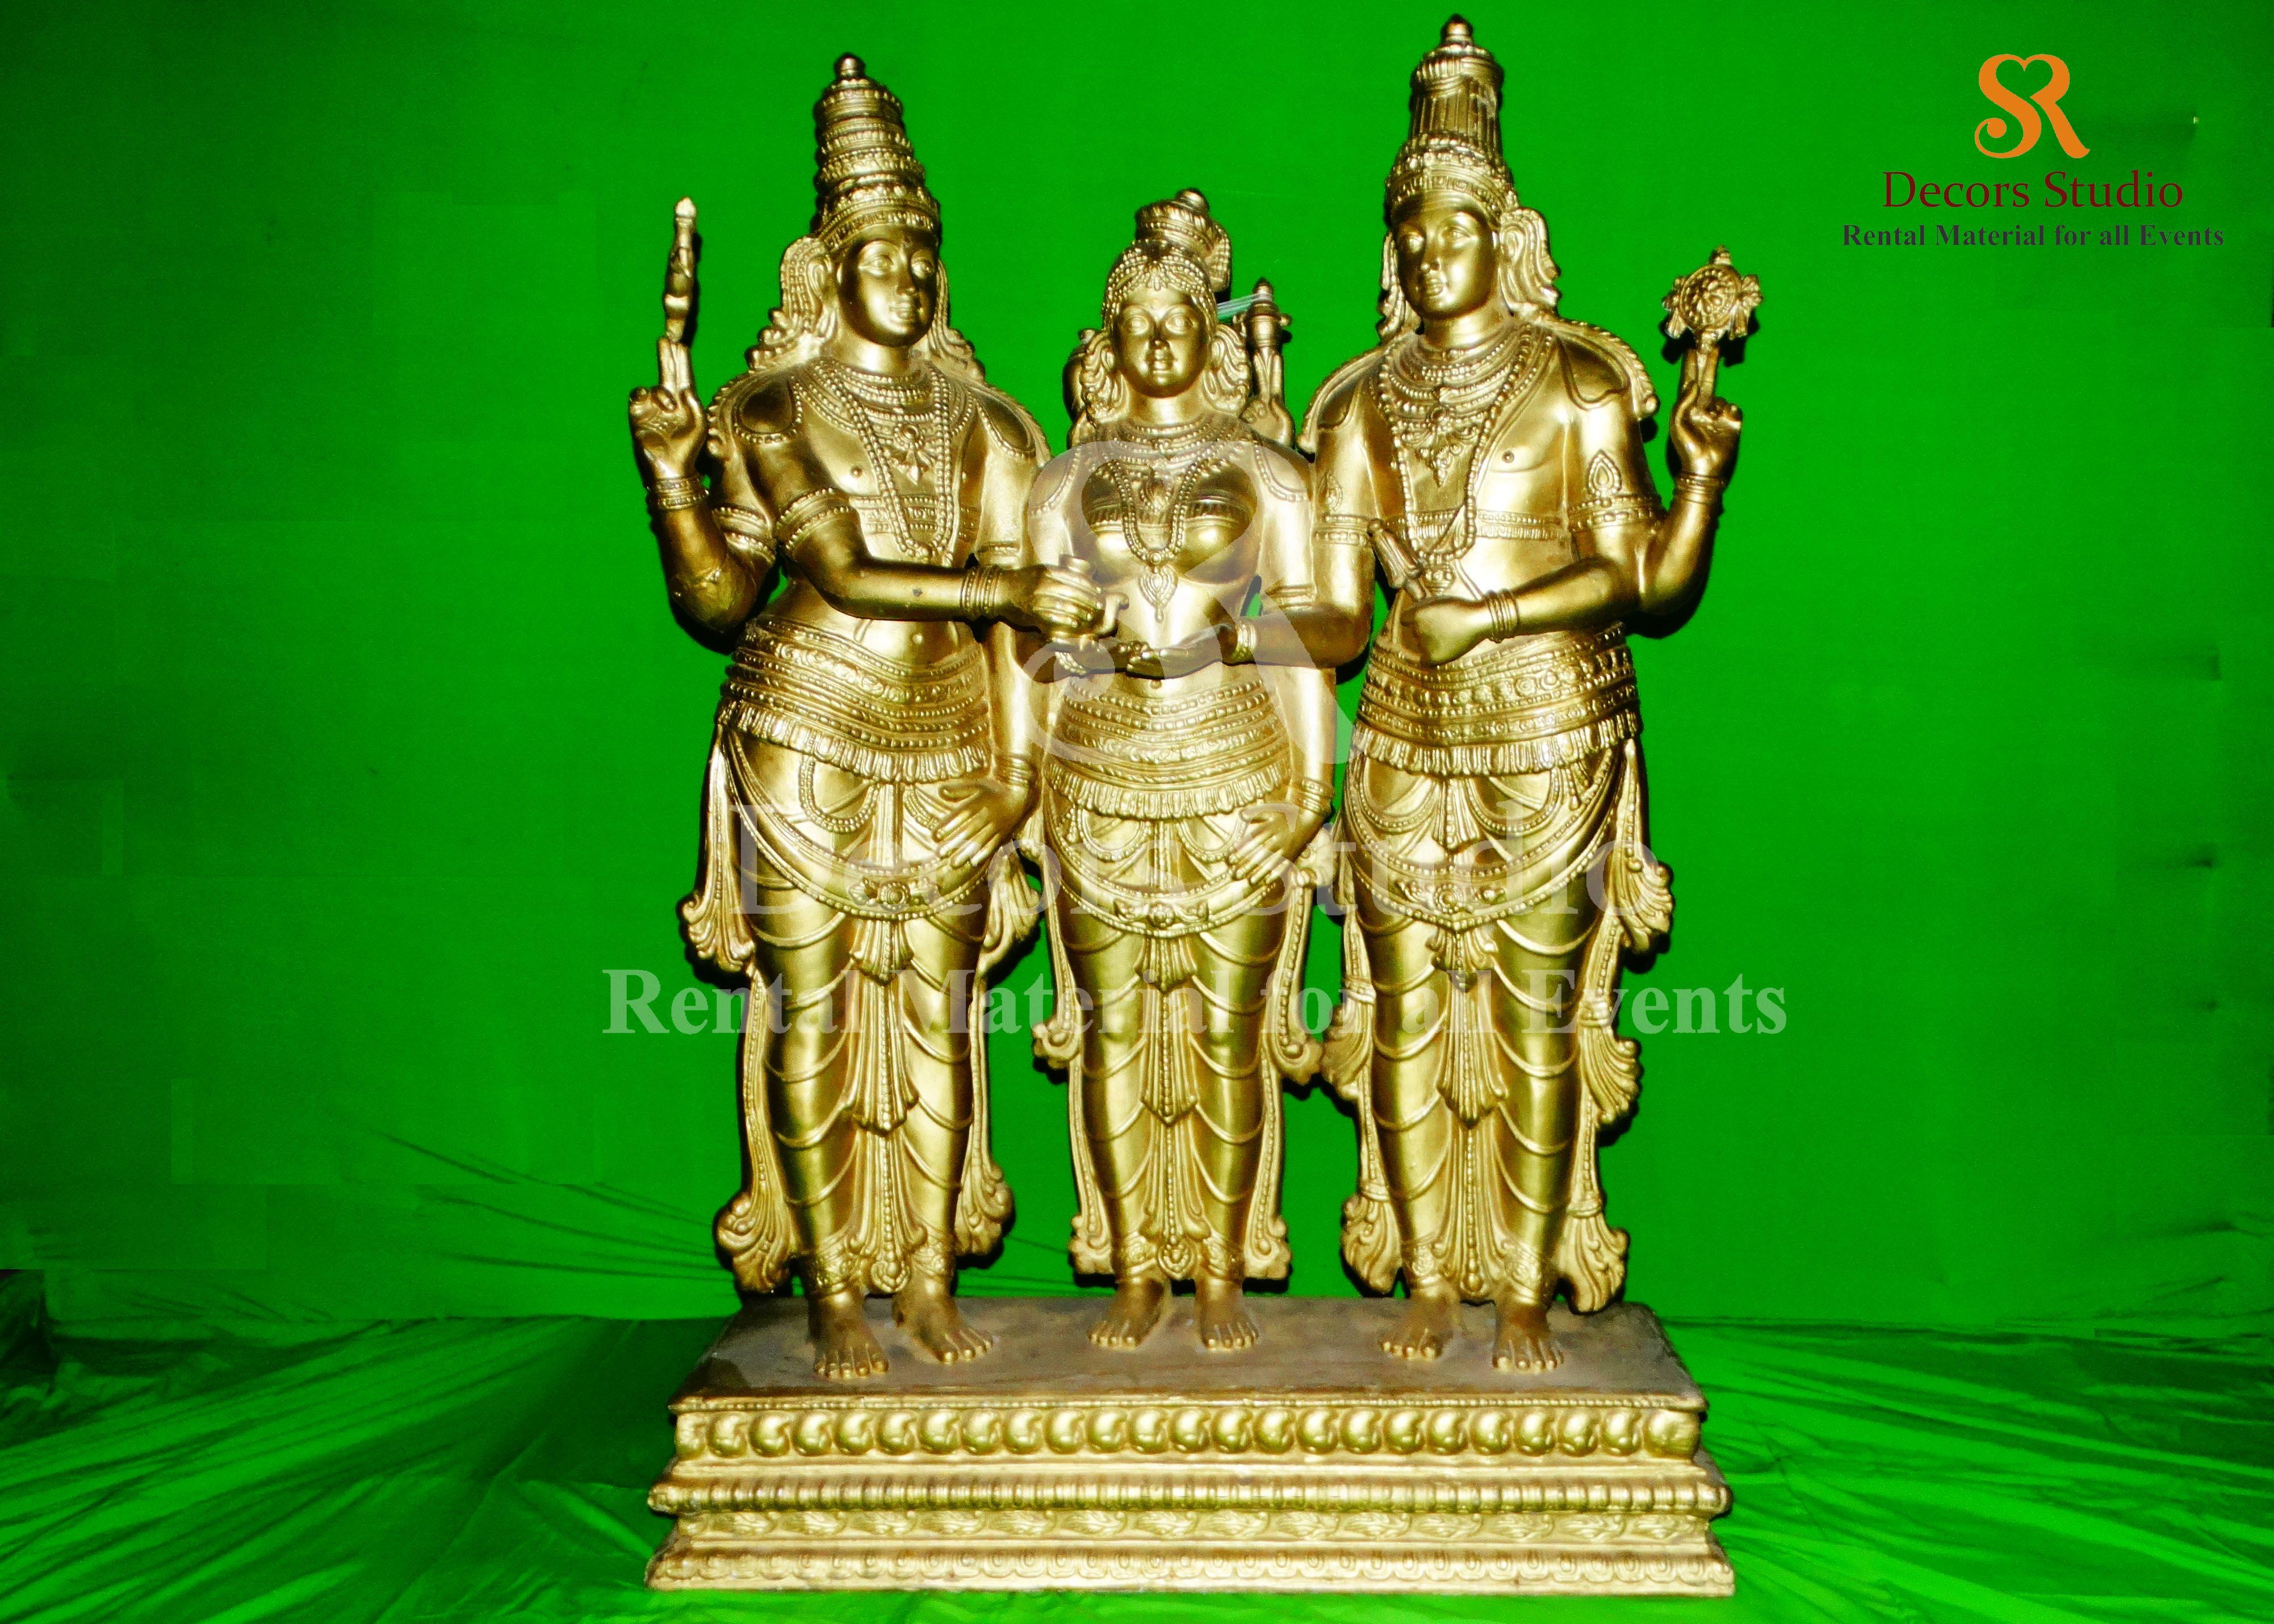 Meenakshi Thiru Kalyanam Statue For Rent Sr Decors Studio Rental Services Statue Studio Rental Studio